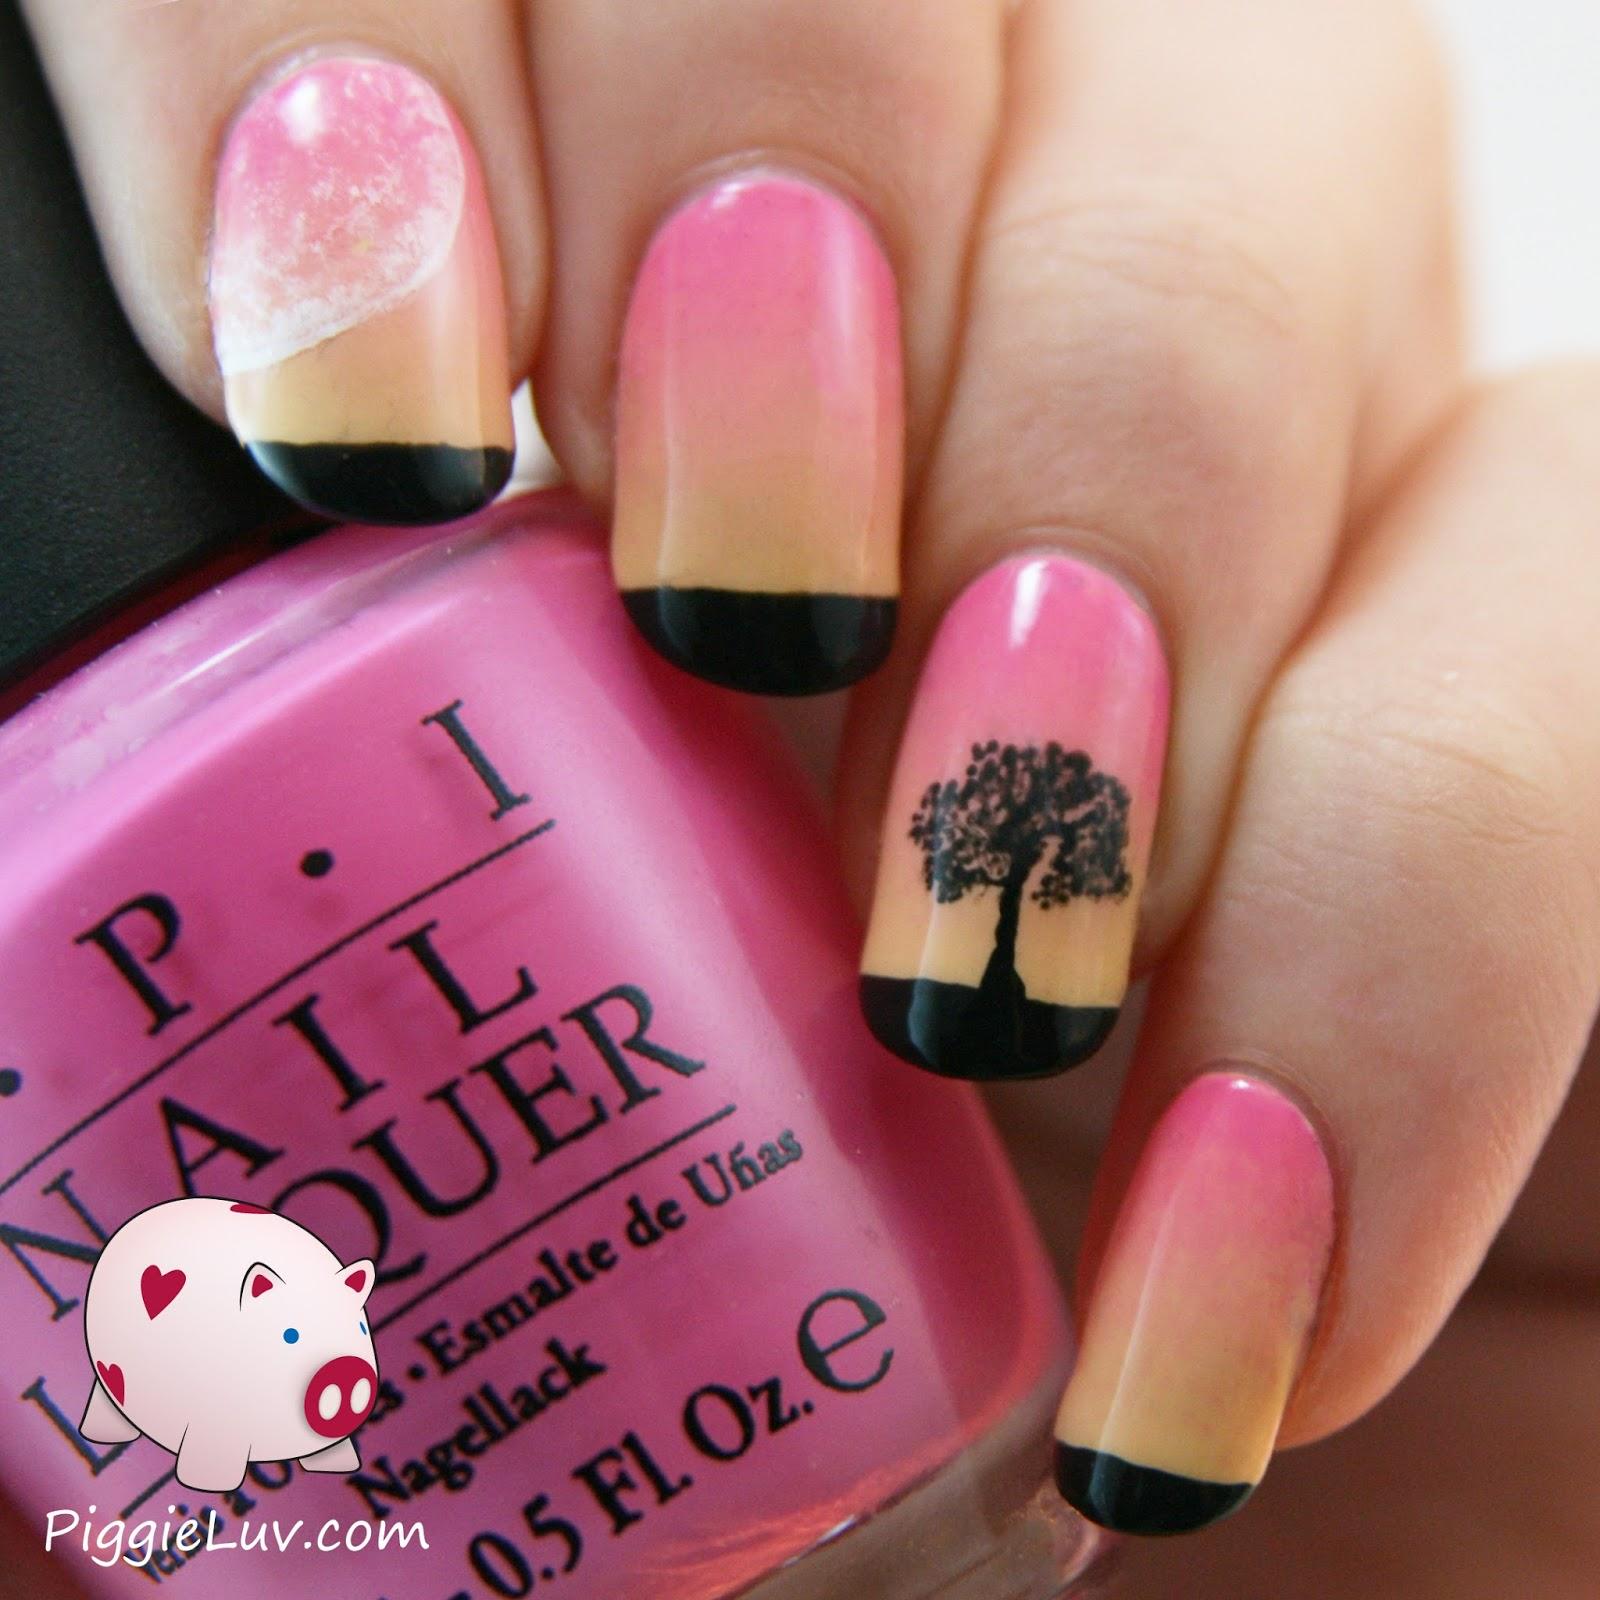 Piggieluv Soft Sunset Gradient Nail Art